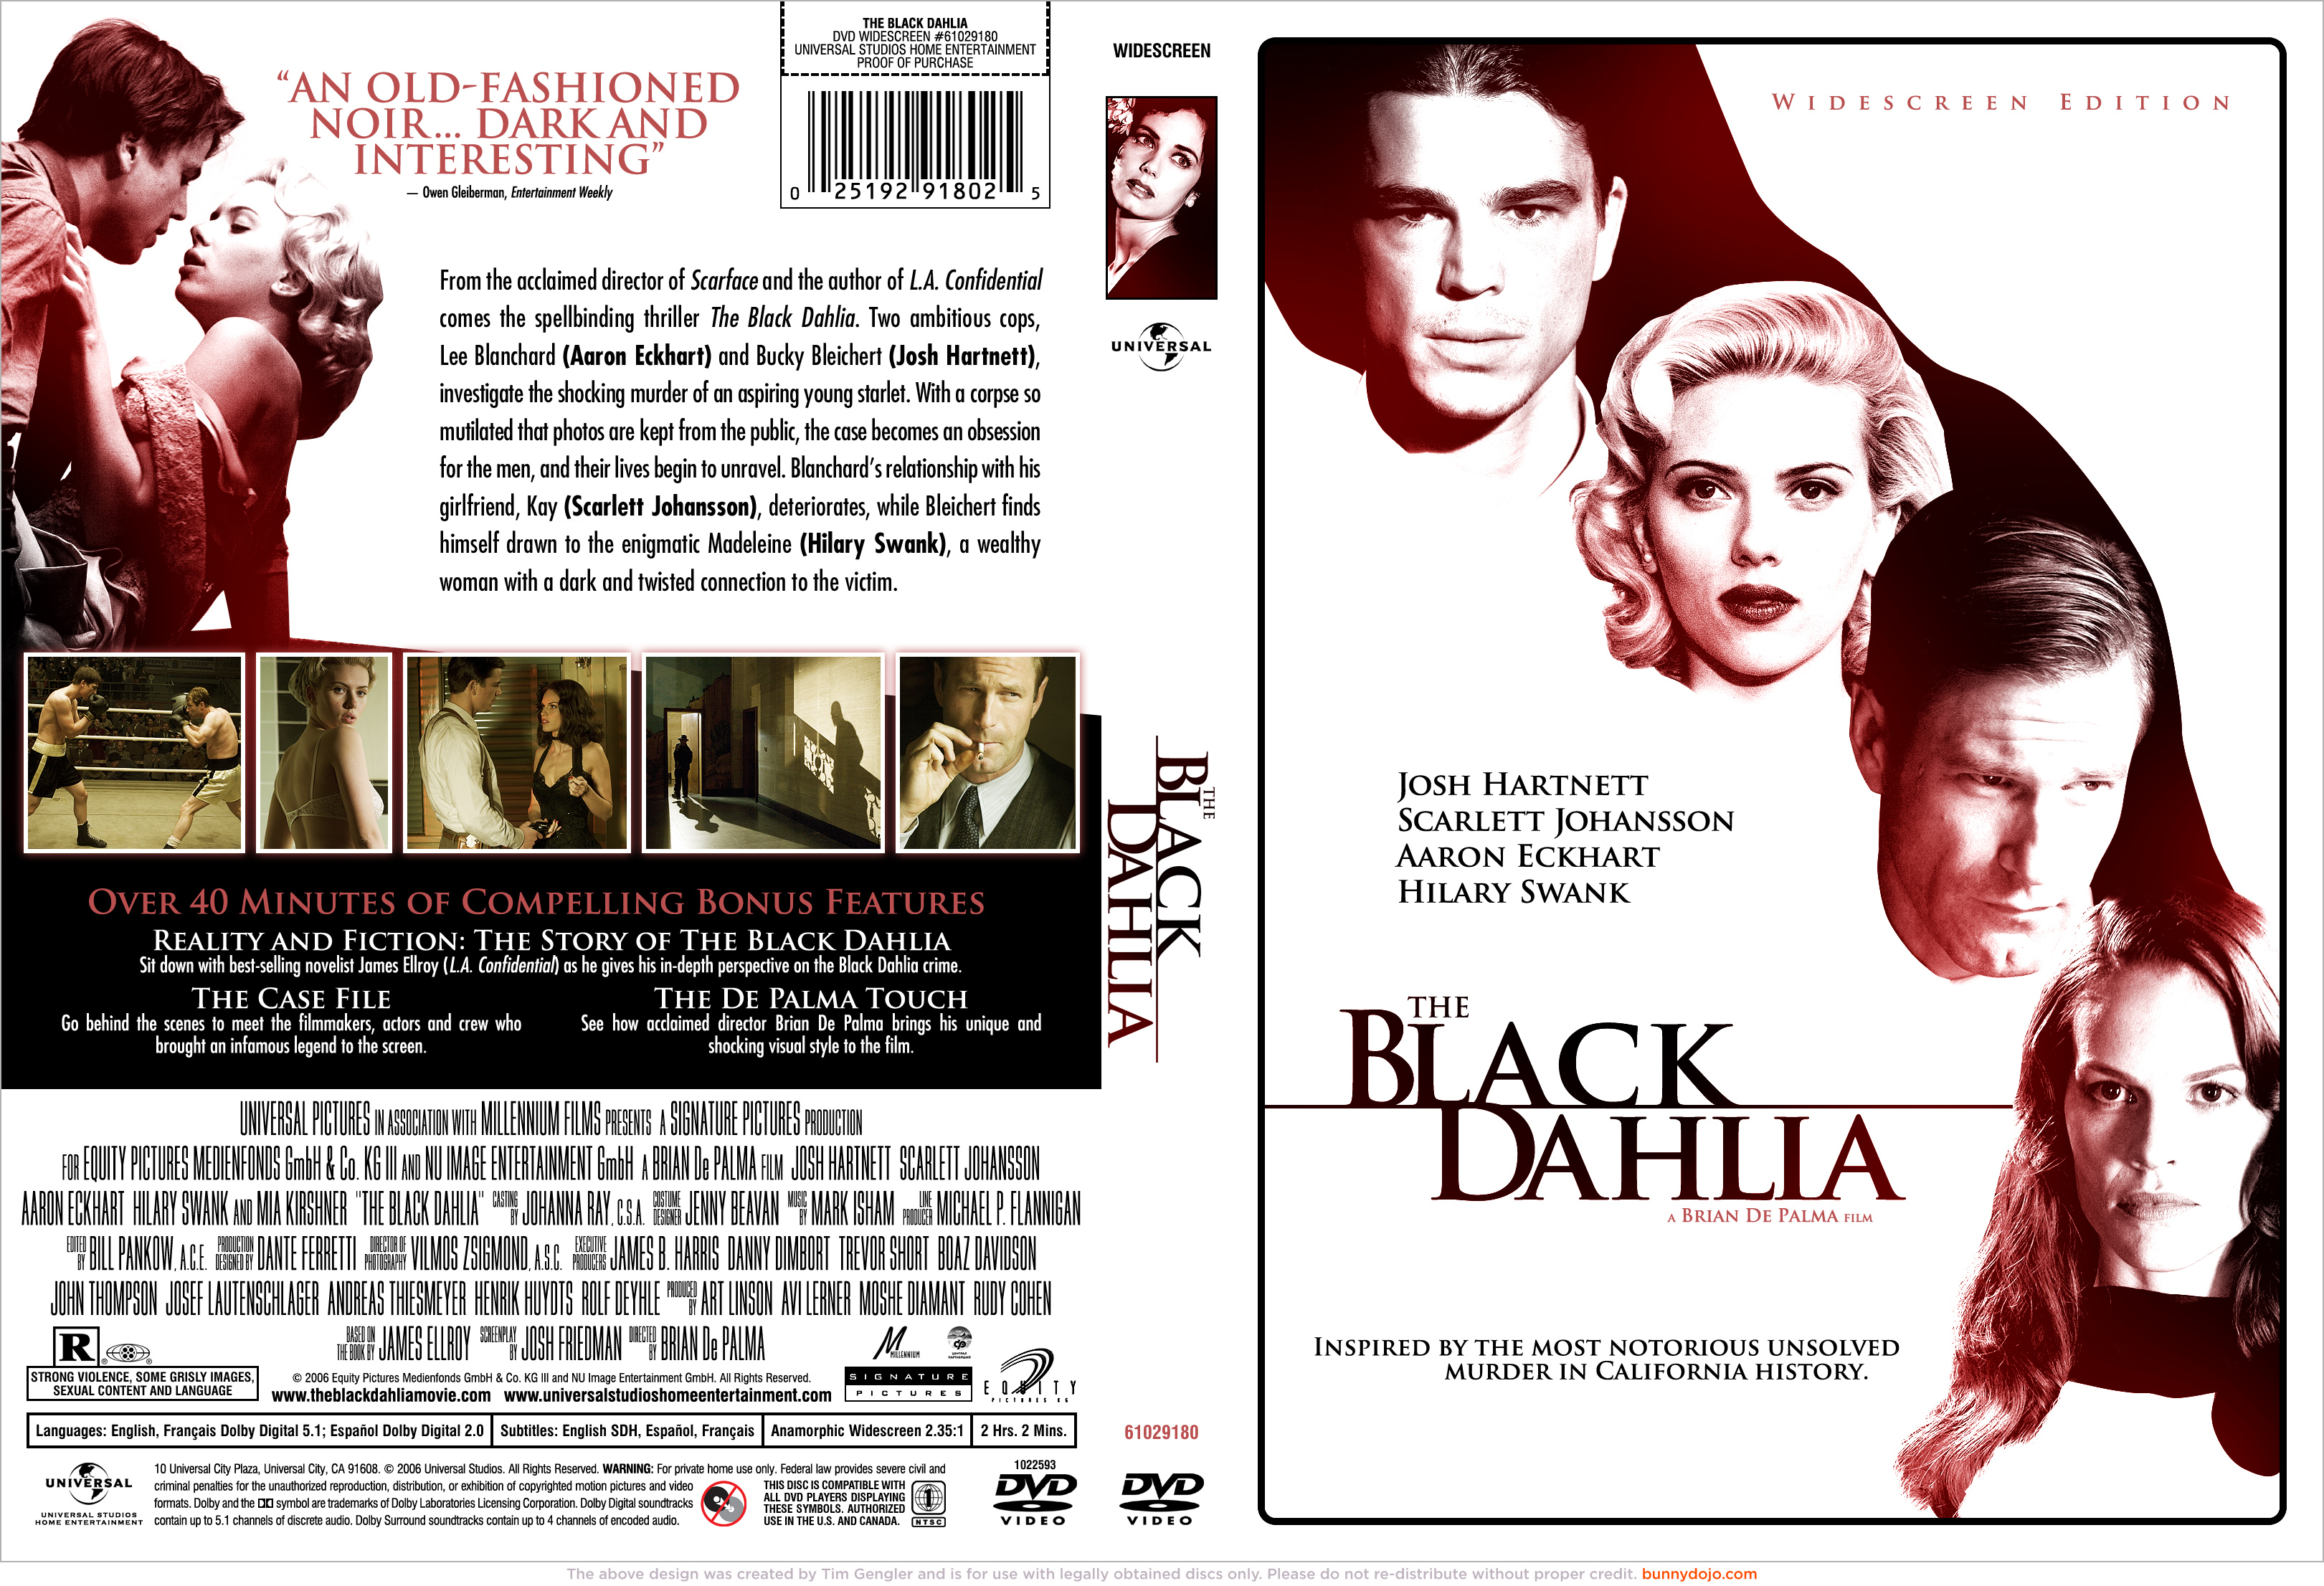 argumentative analysis the black dahlia